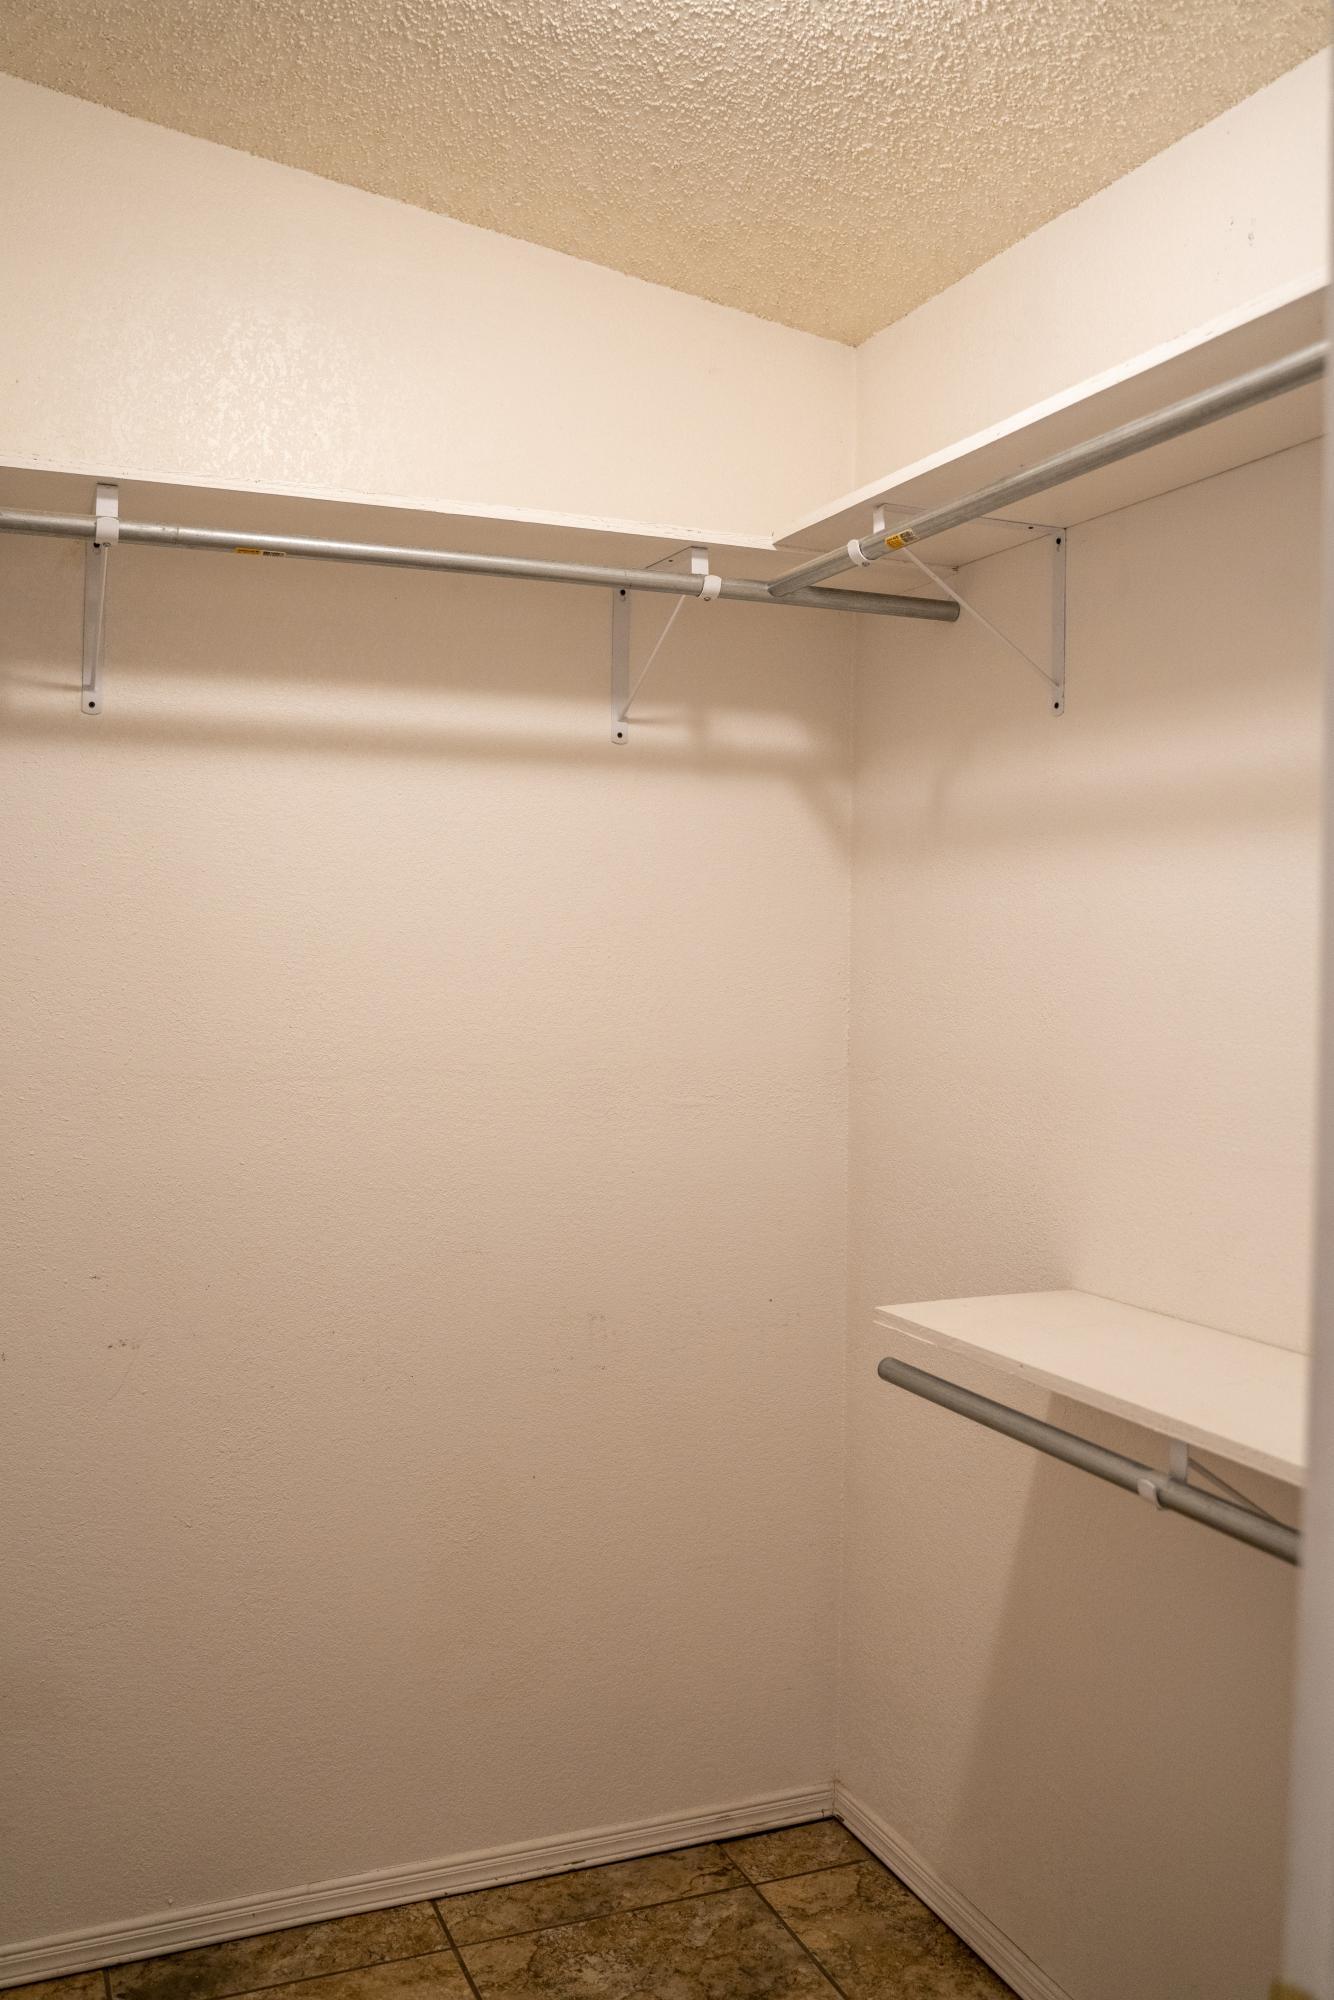 712 Cent master closet